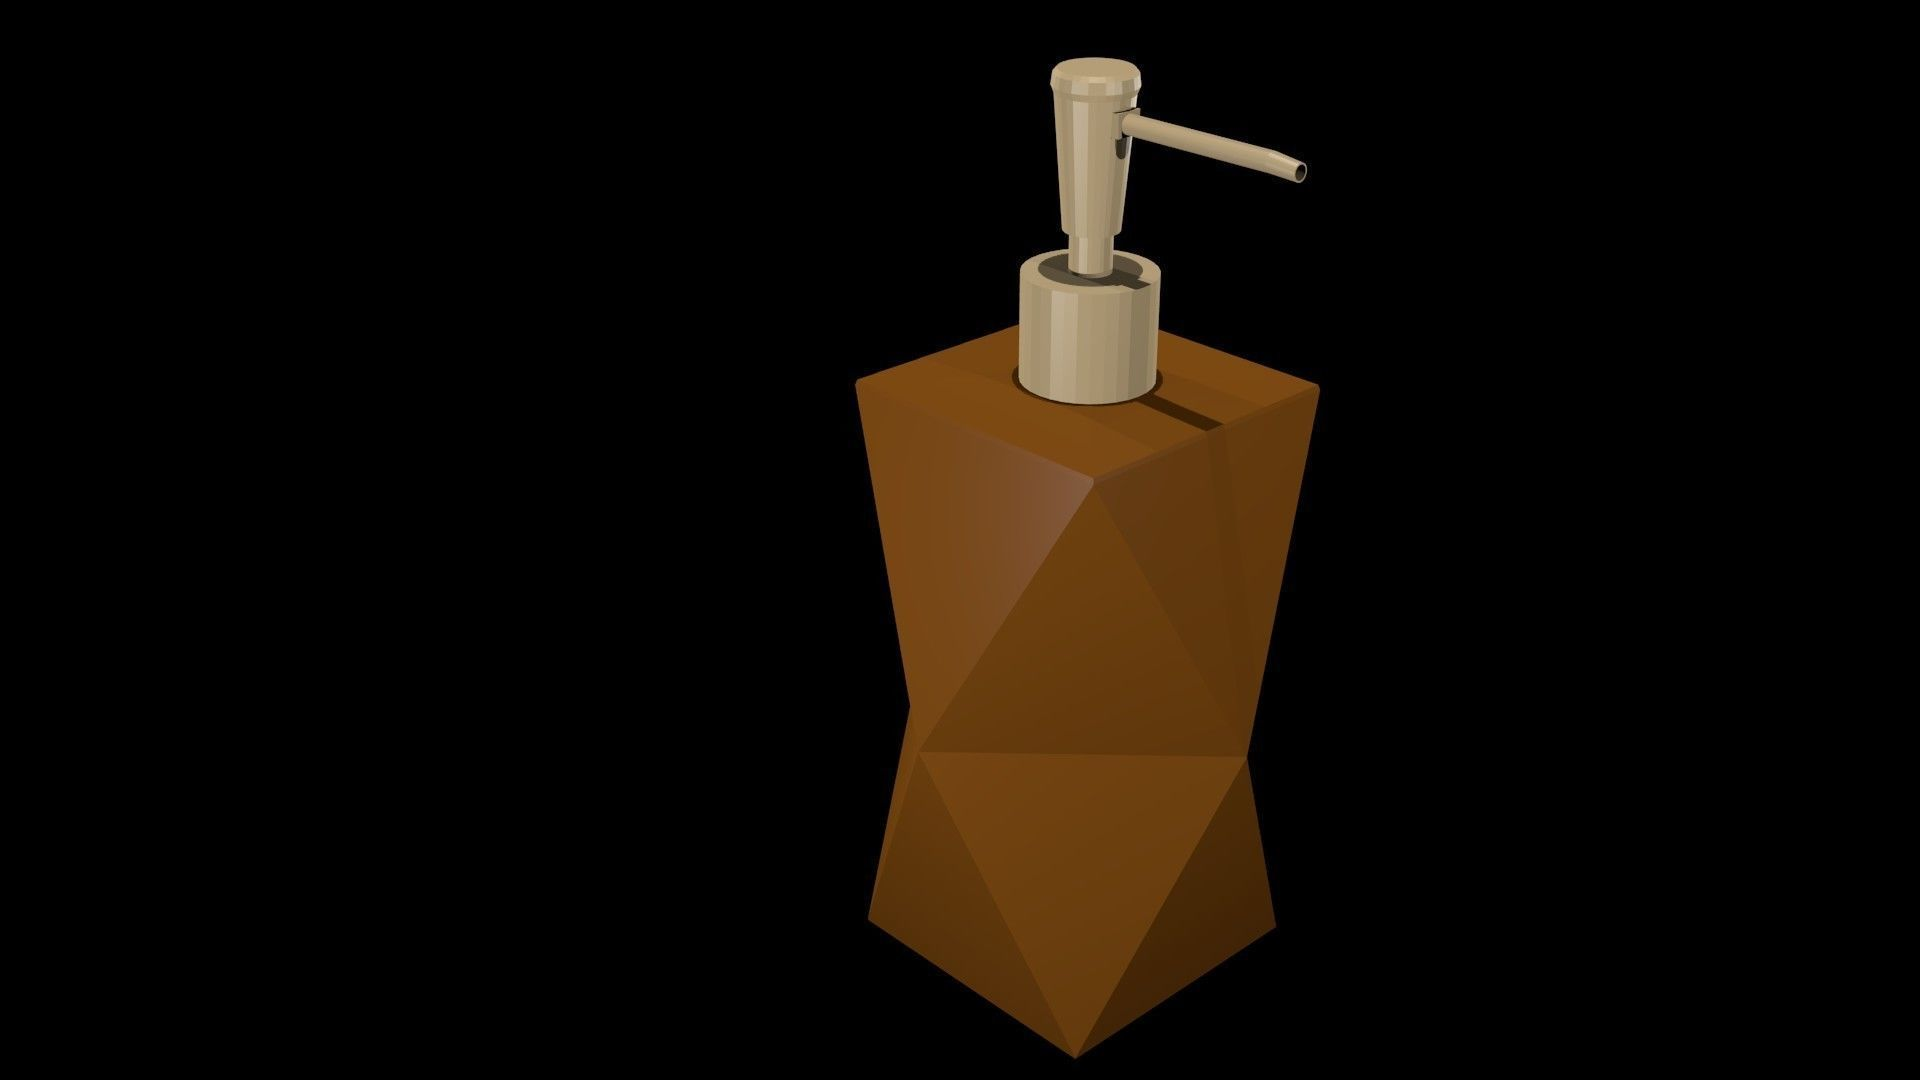 Low poly Dispenser